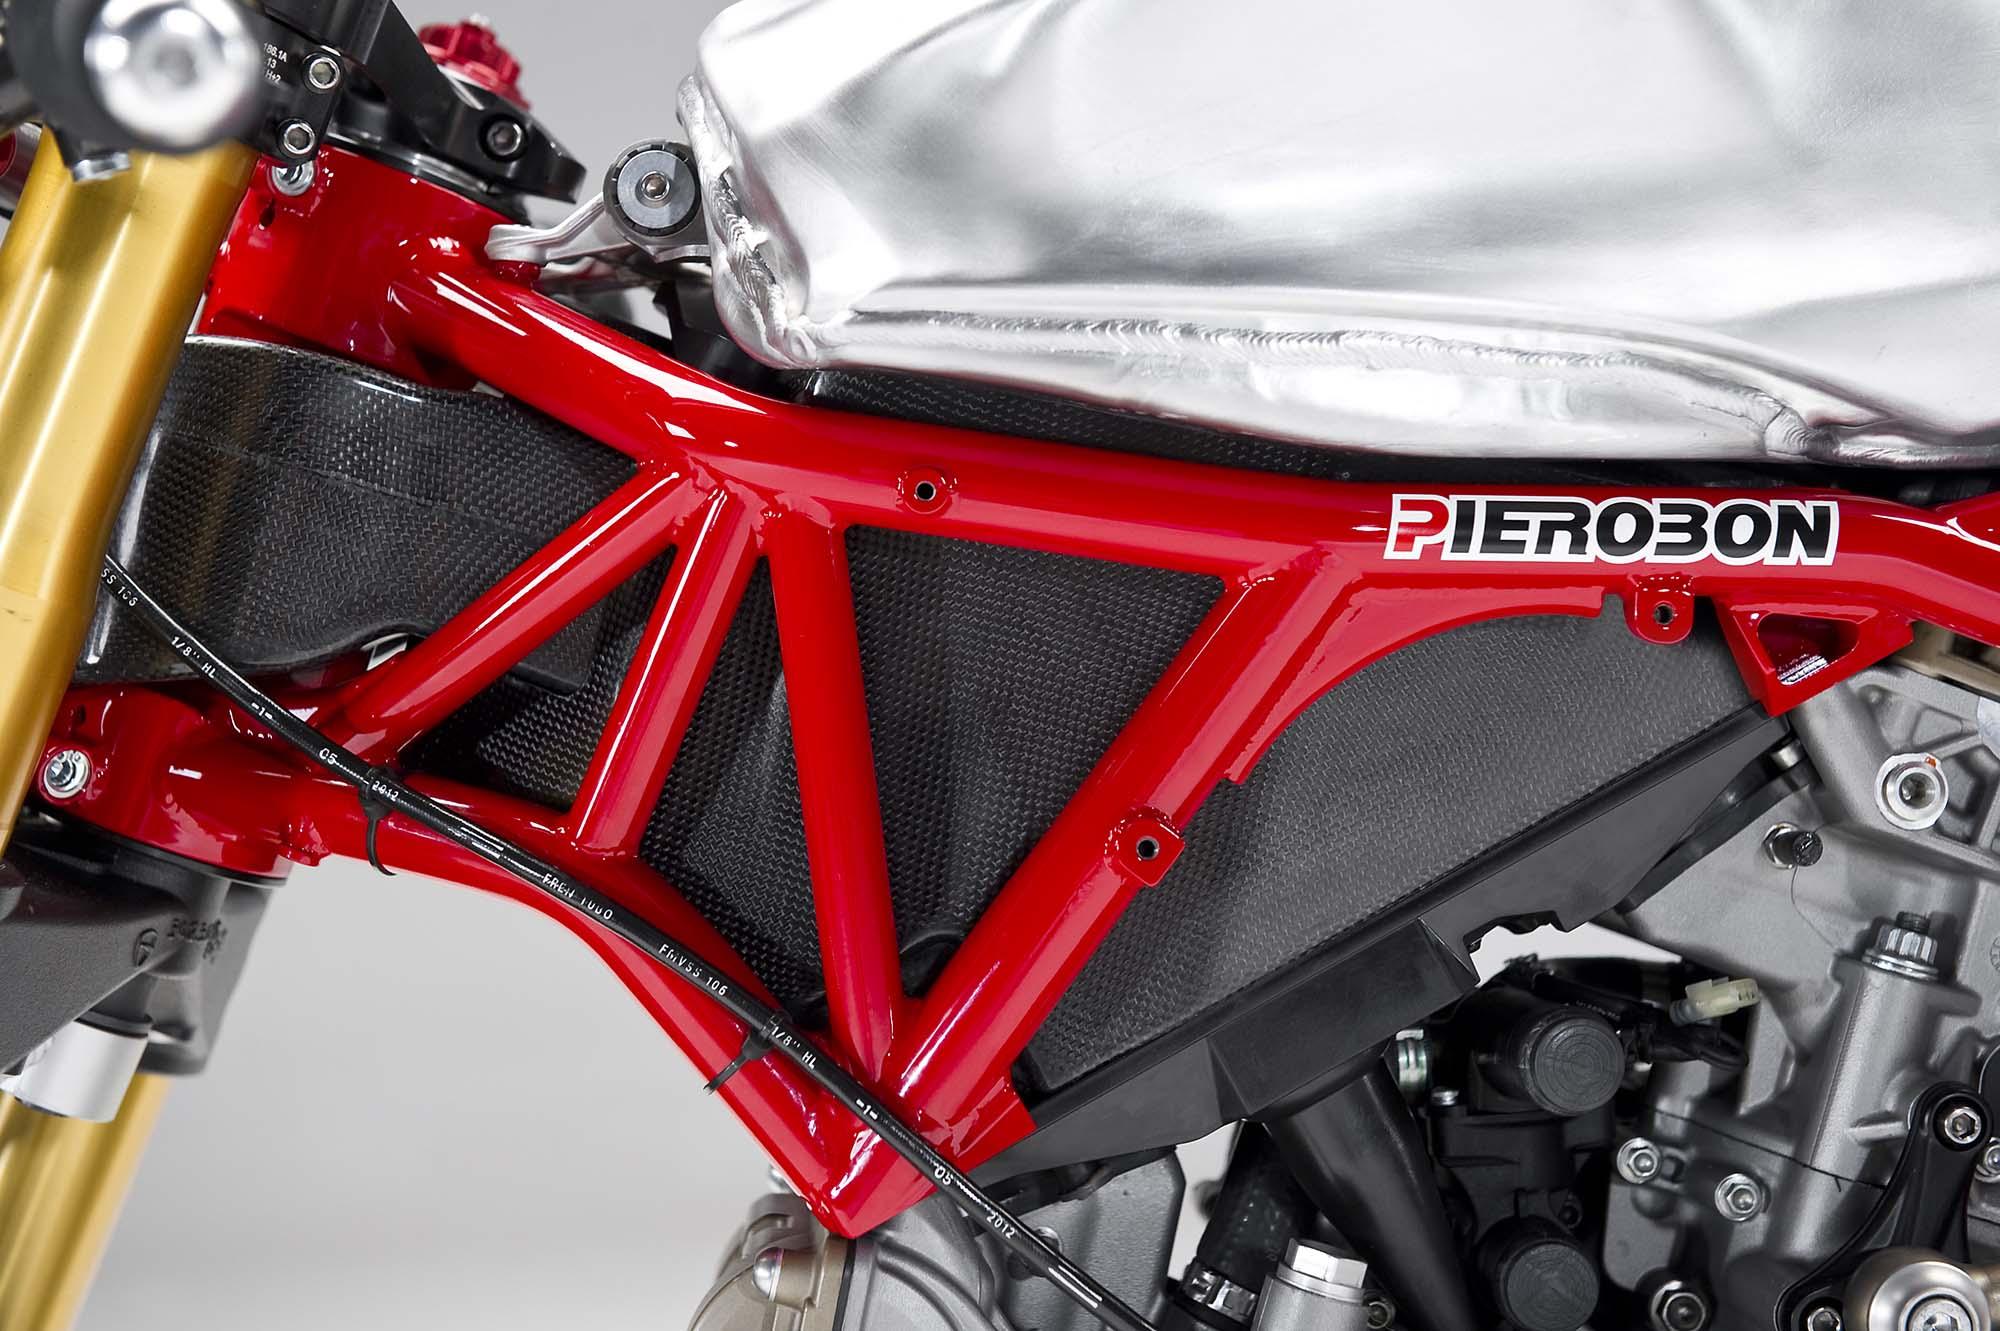 Pierobon-trellis-frame-Ducati-1199-Panigale-18